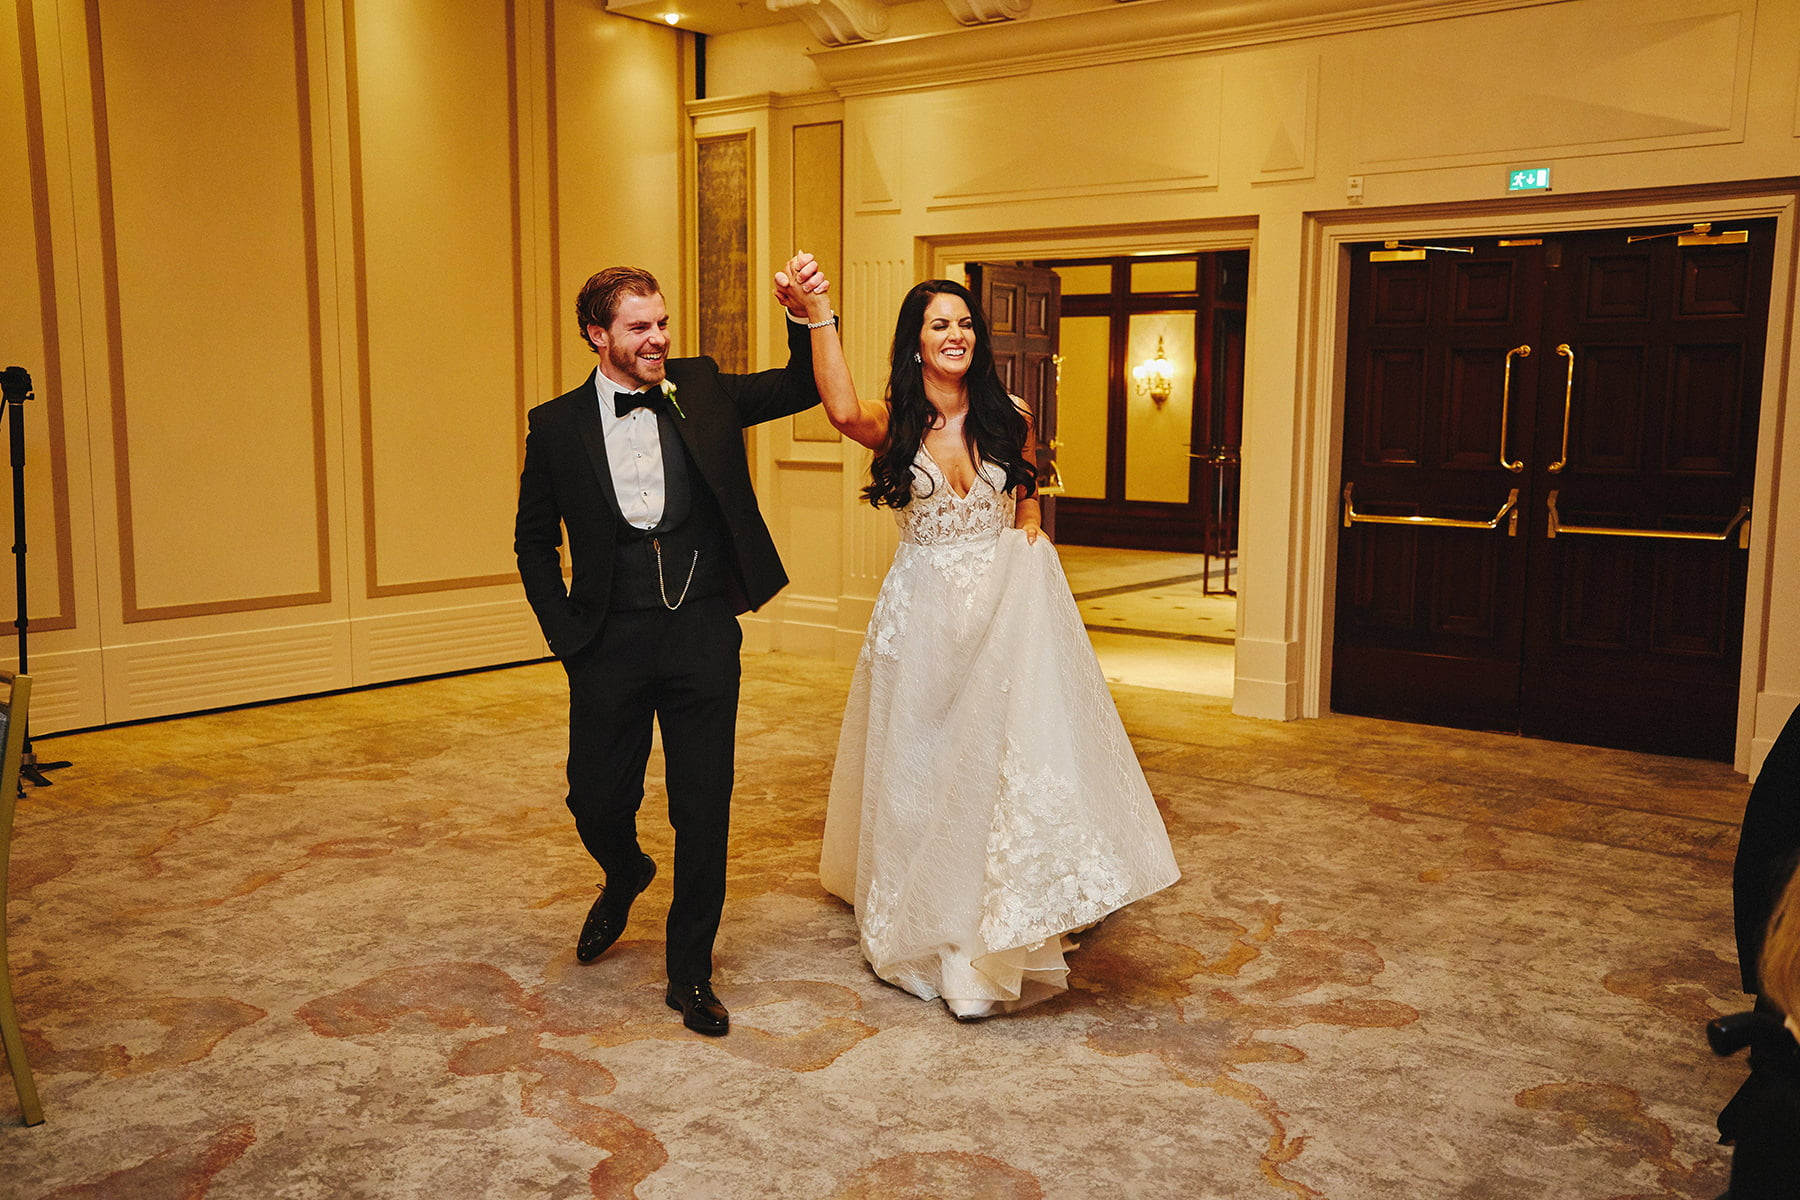 POWERSCOURT HOTEL RESORT INTIMATE WEDDING 91